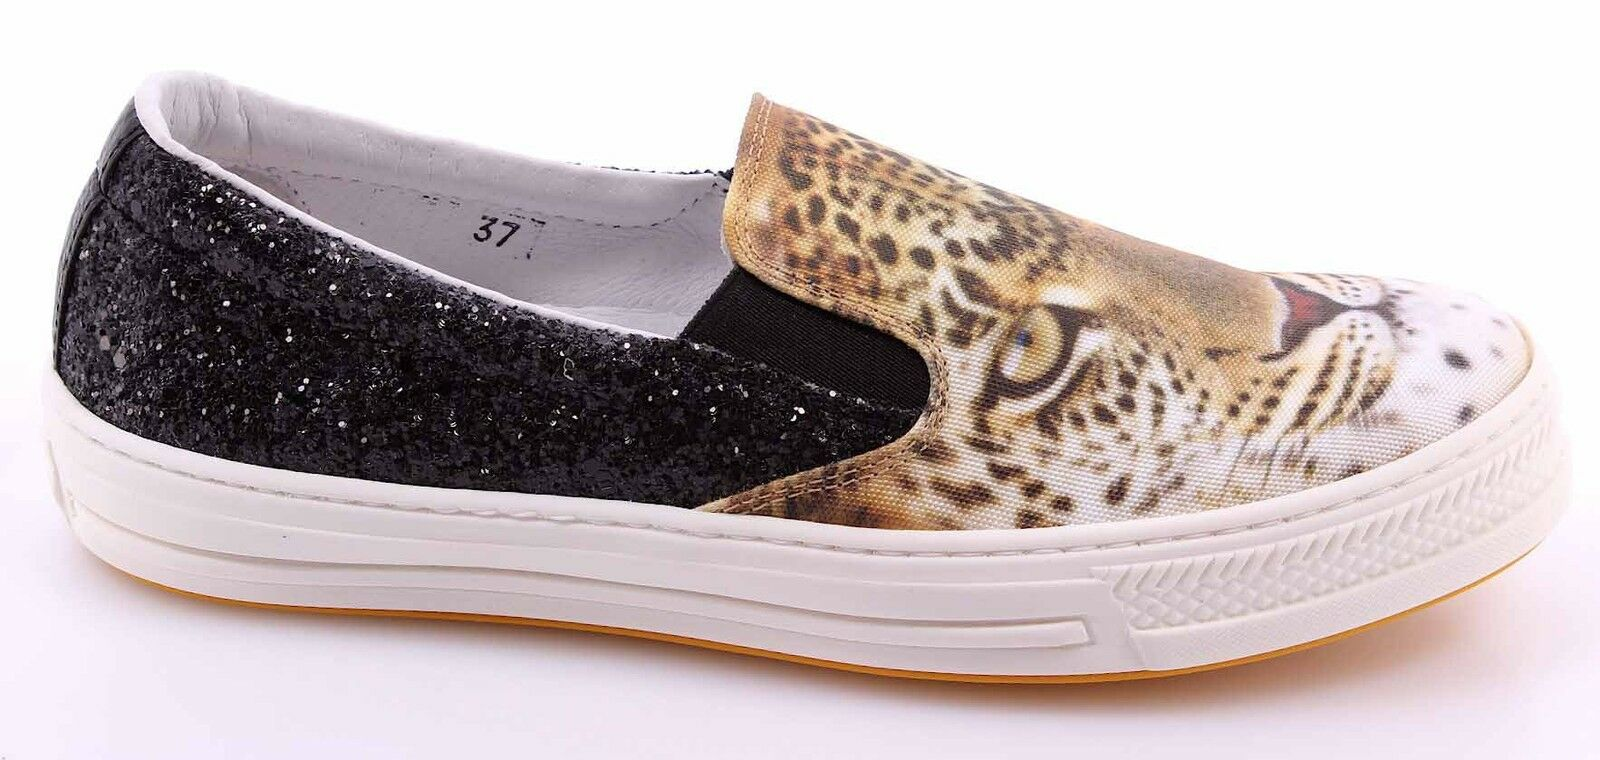 Damen Schuhe  Slip On Sneakers CHANGE  Schuhe Giaguaro Raso Bianco Glitter Nero Made IT 4f9b00